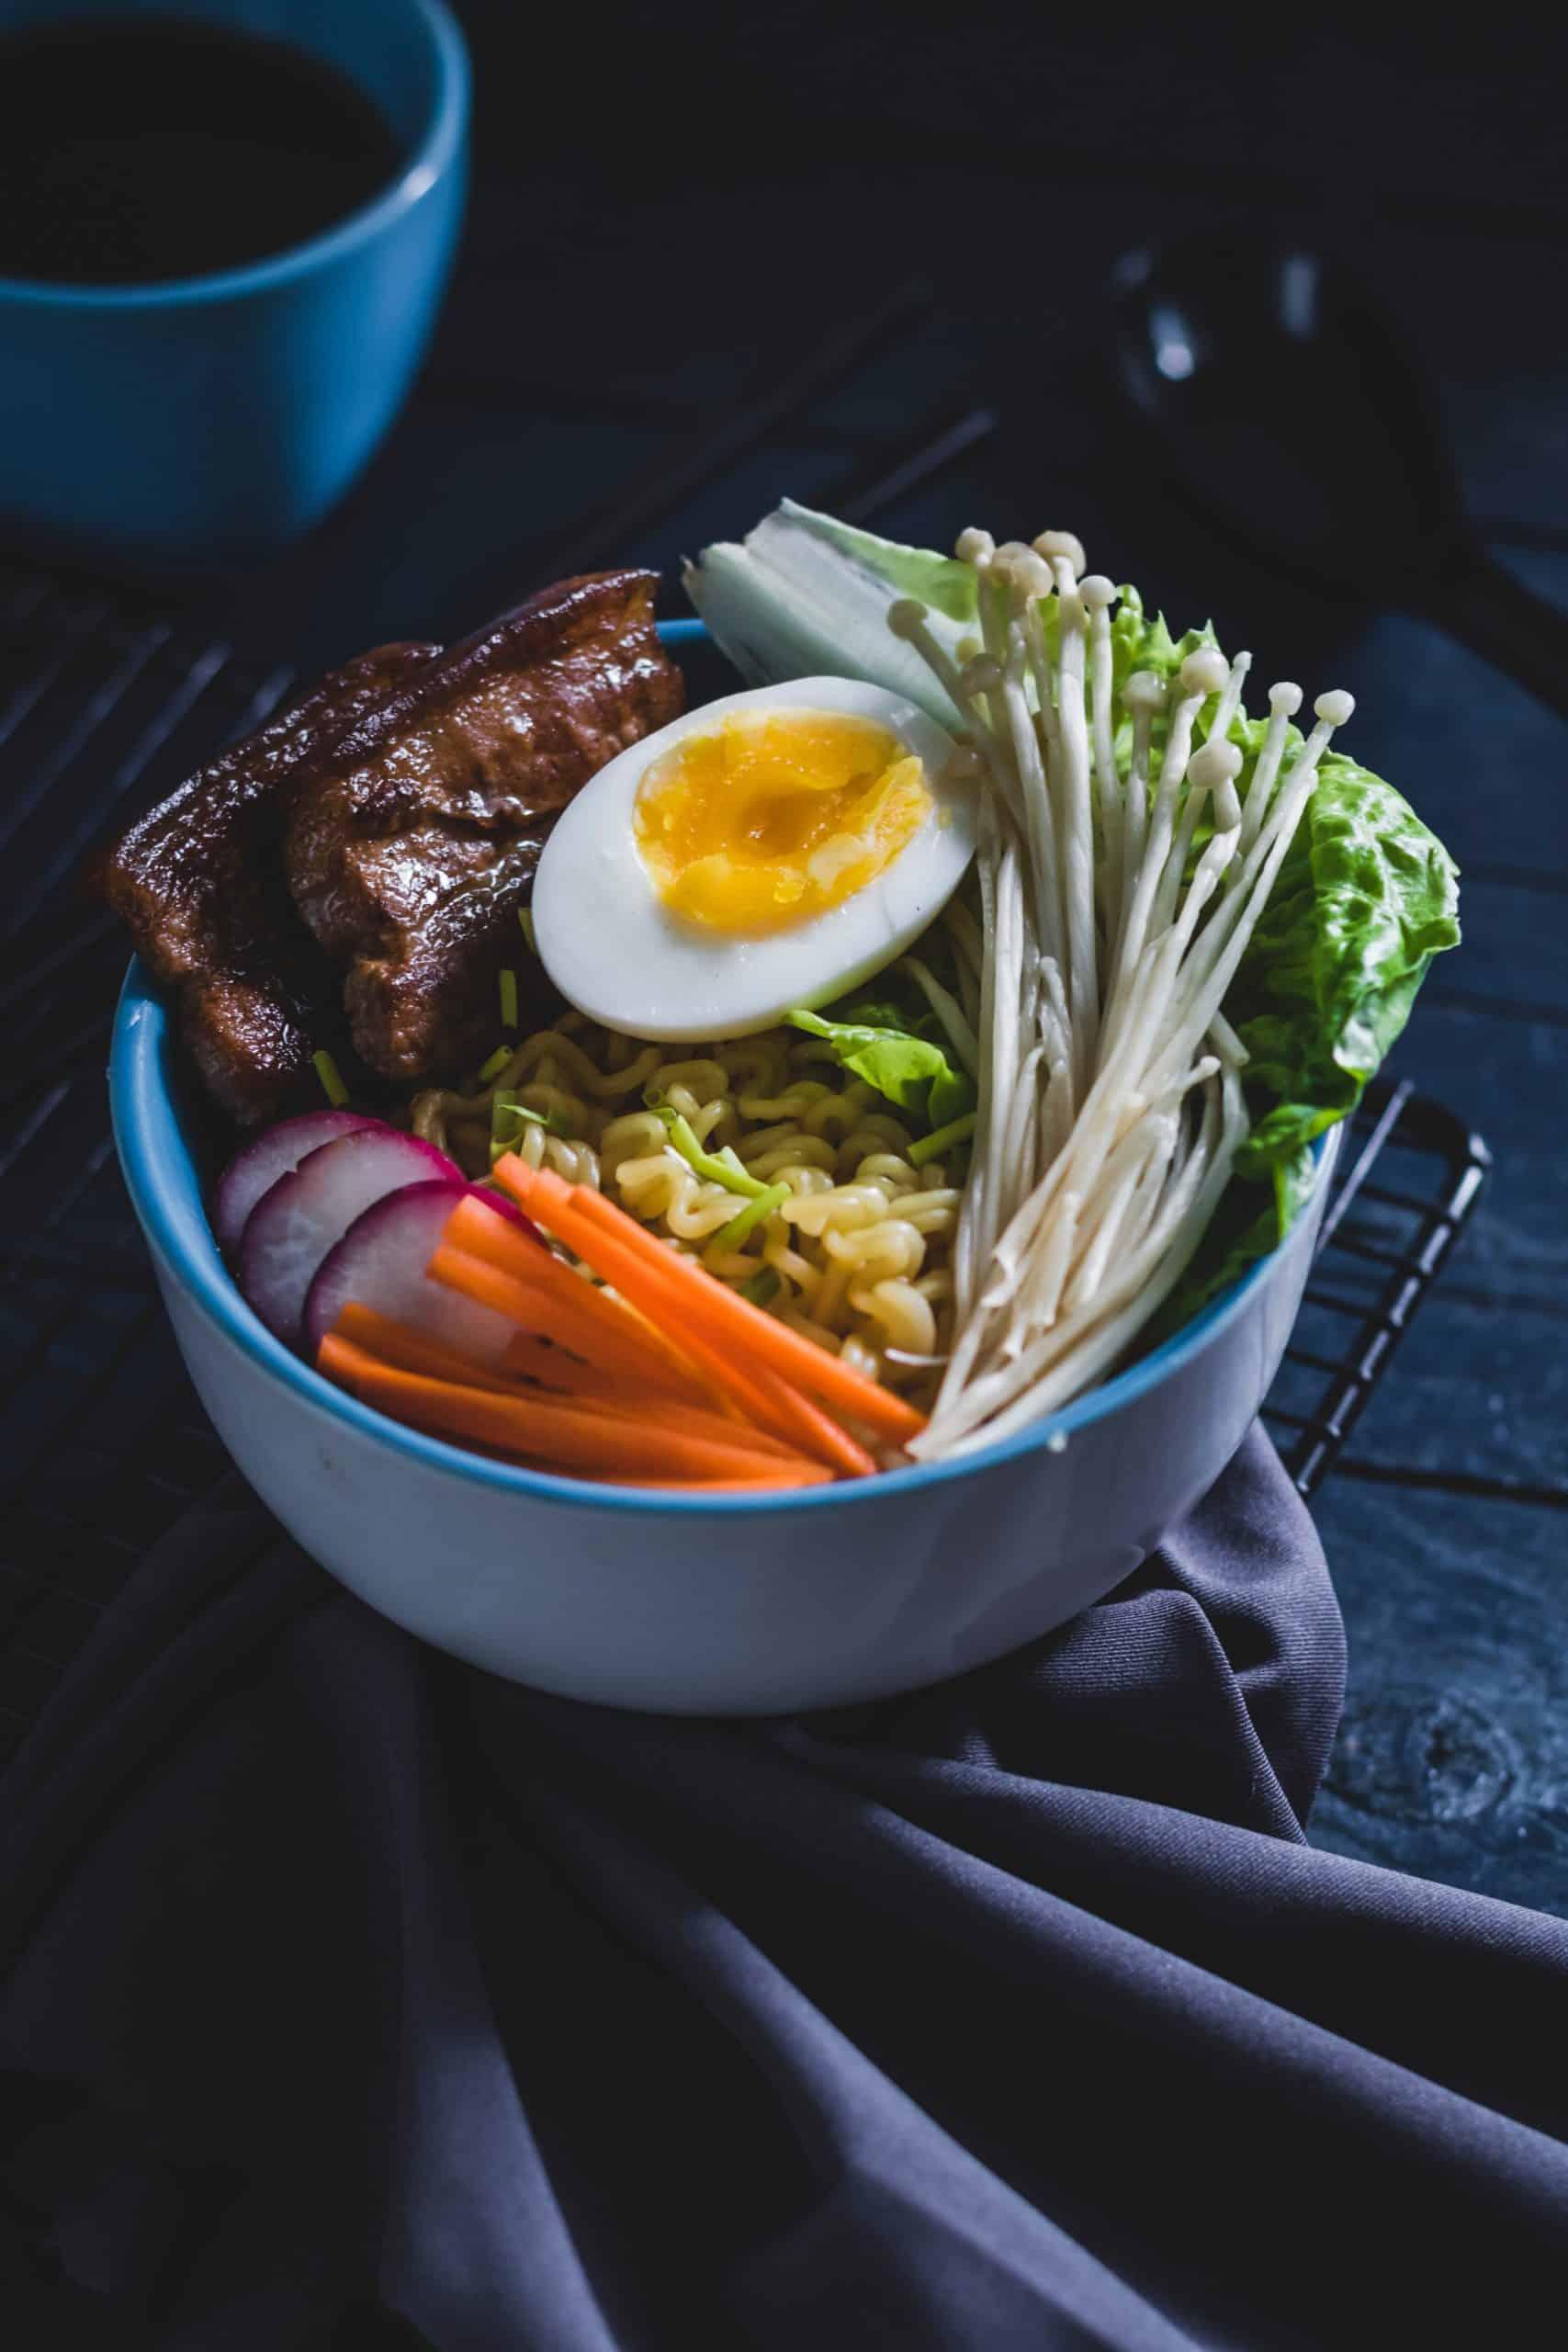 Health Benefits of Enokitake Mushrooms